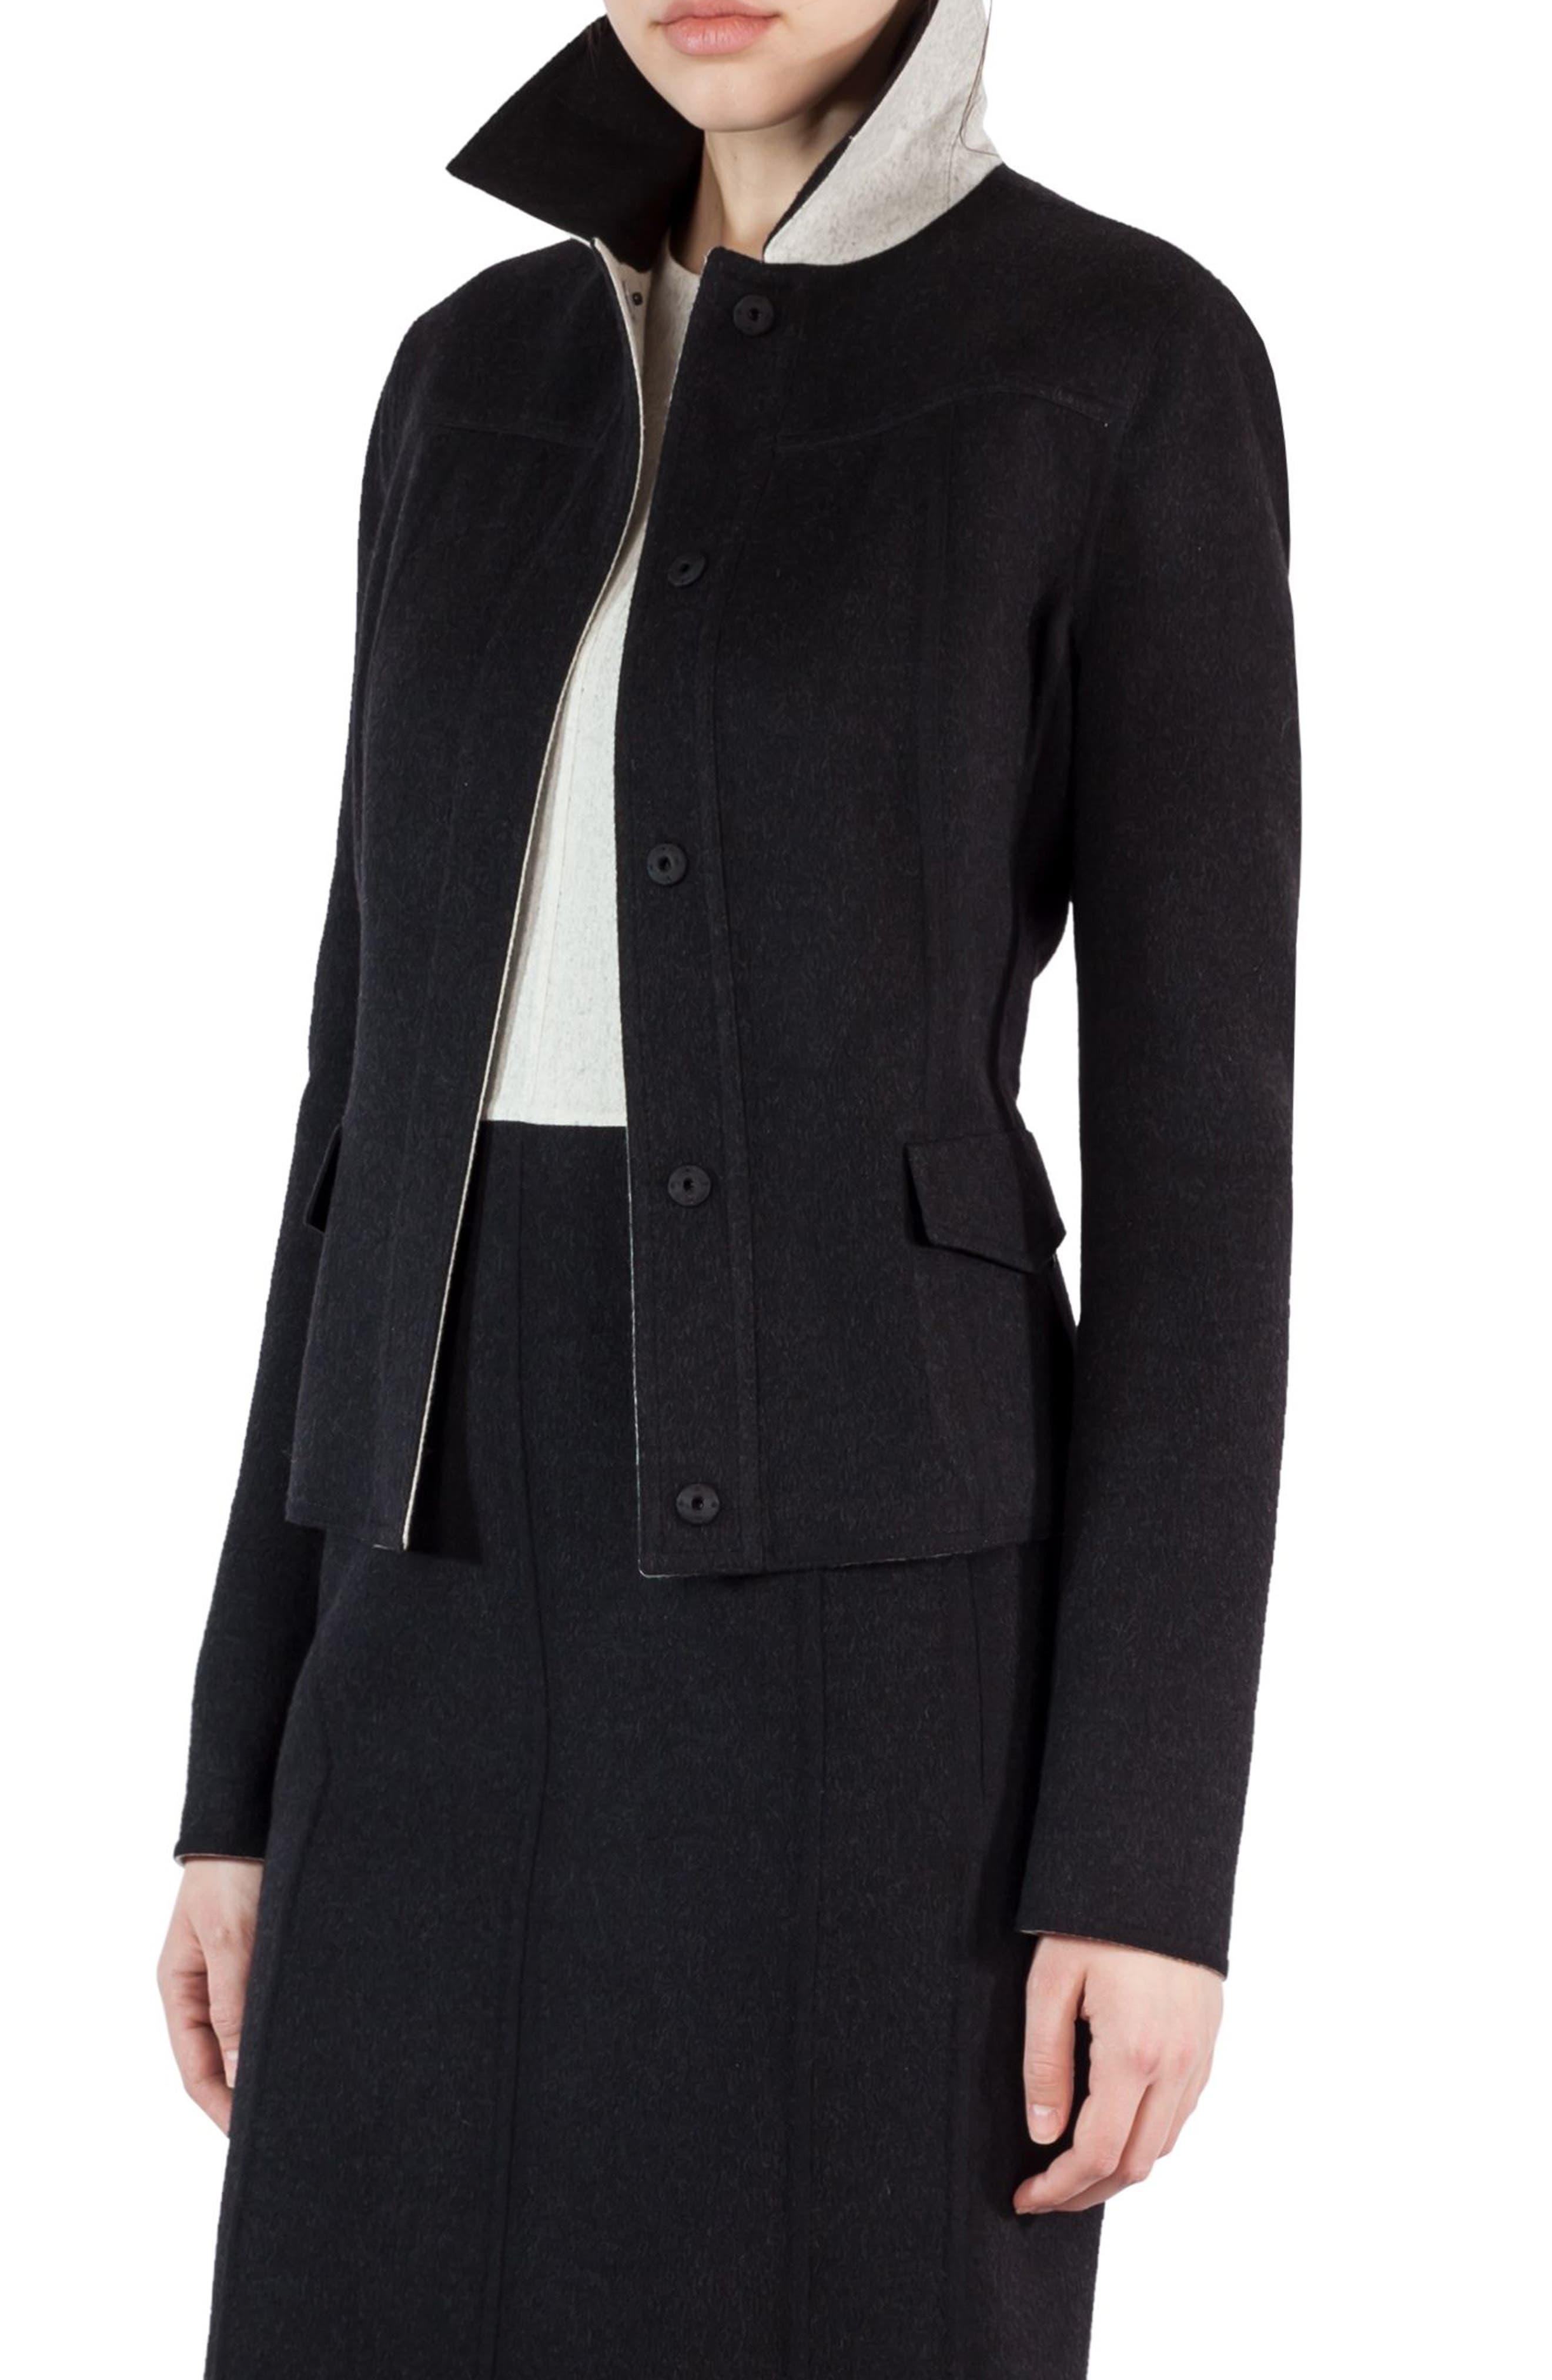 Akris Double Face Wool Reversible Bicolor Jacket